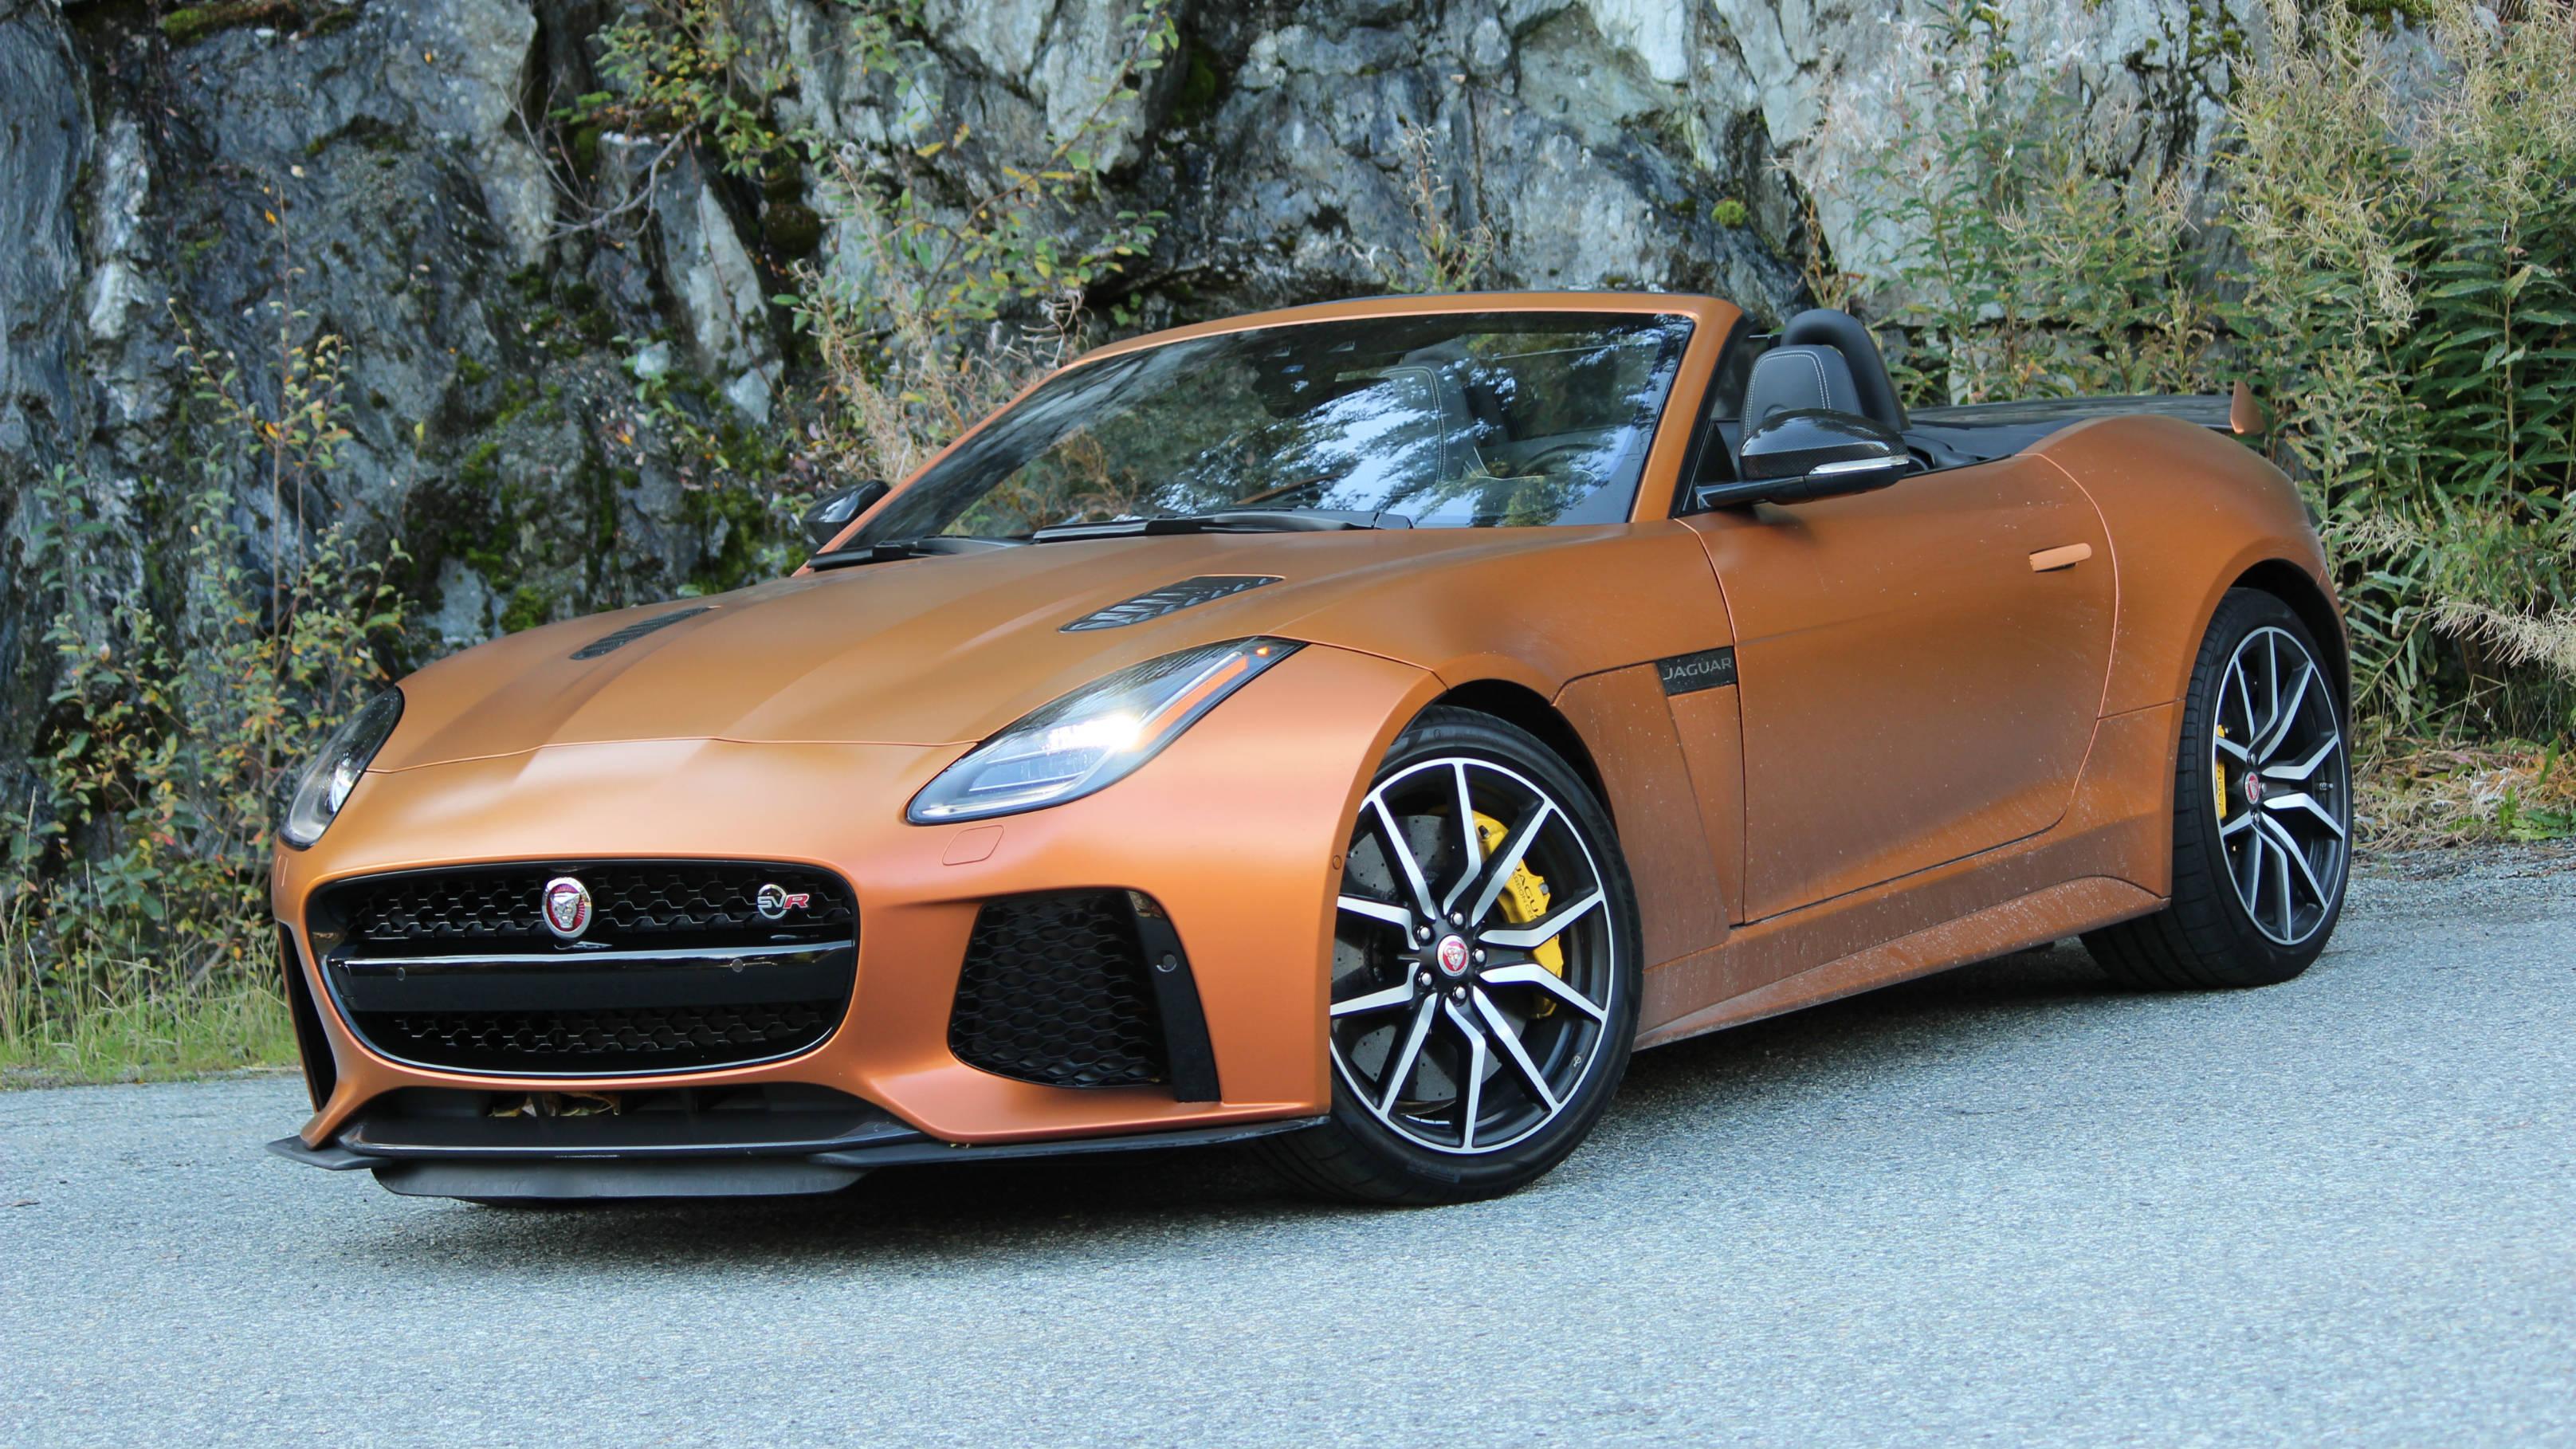 Review 2020 Jaguar F-Type SVR Convertible